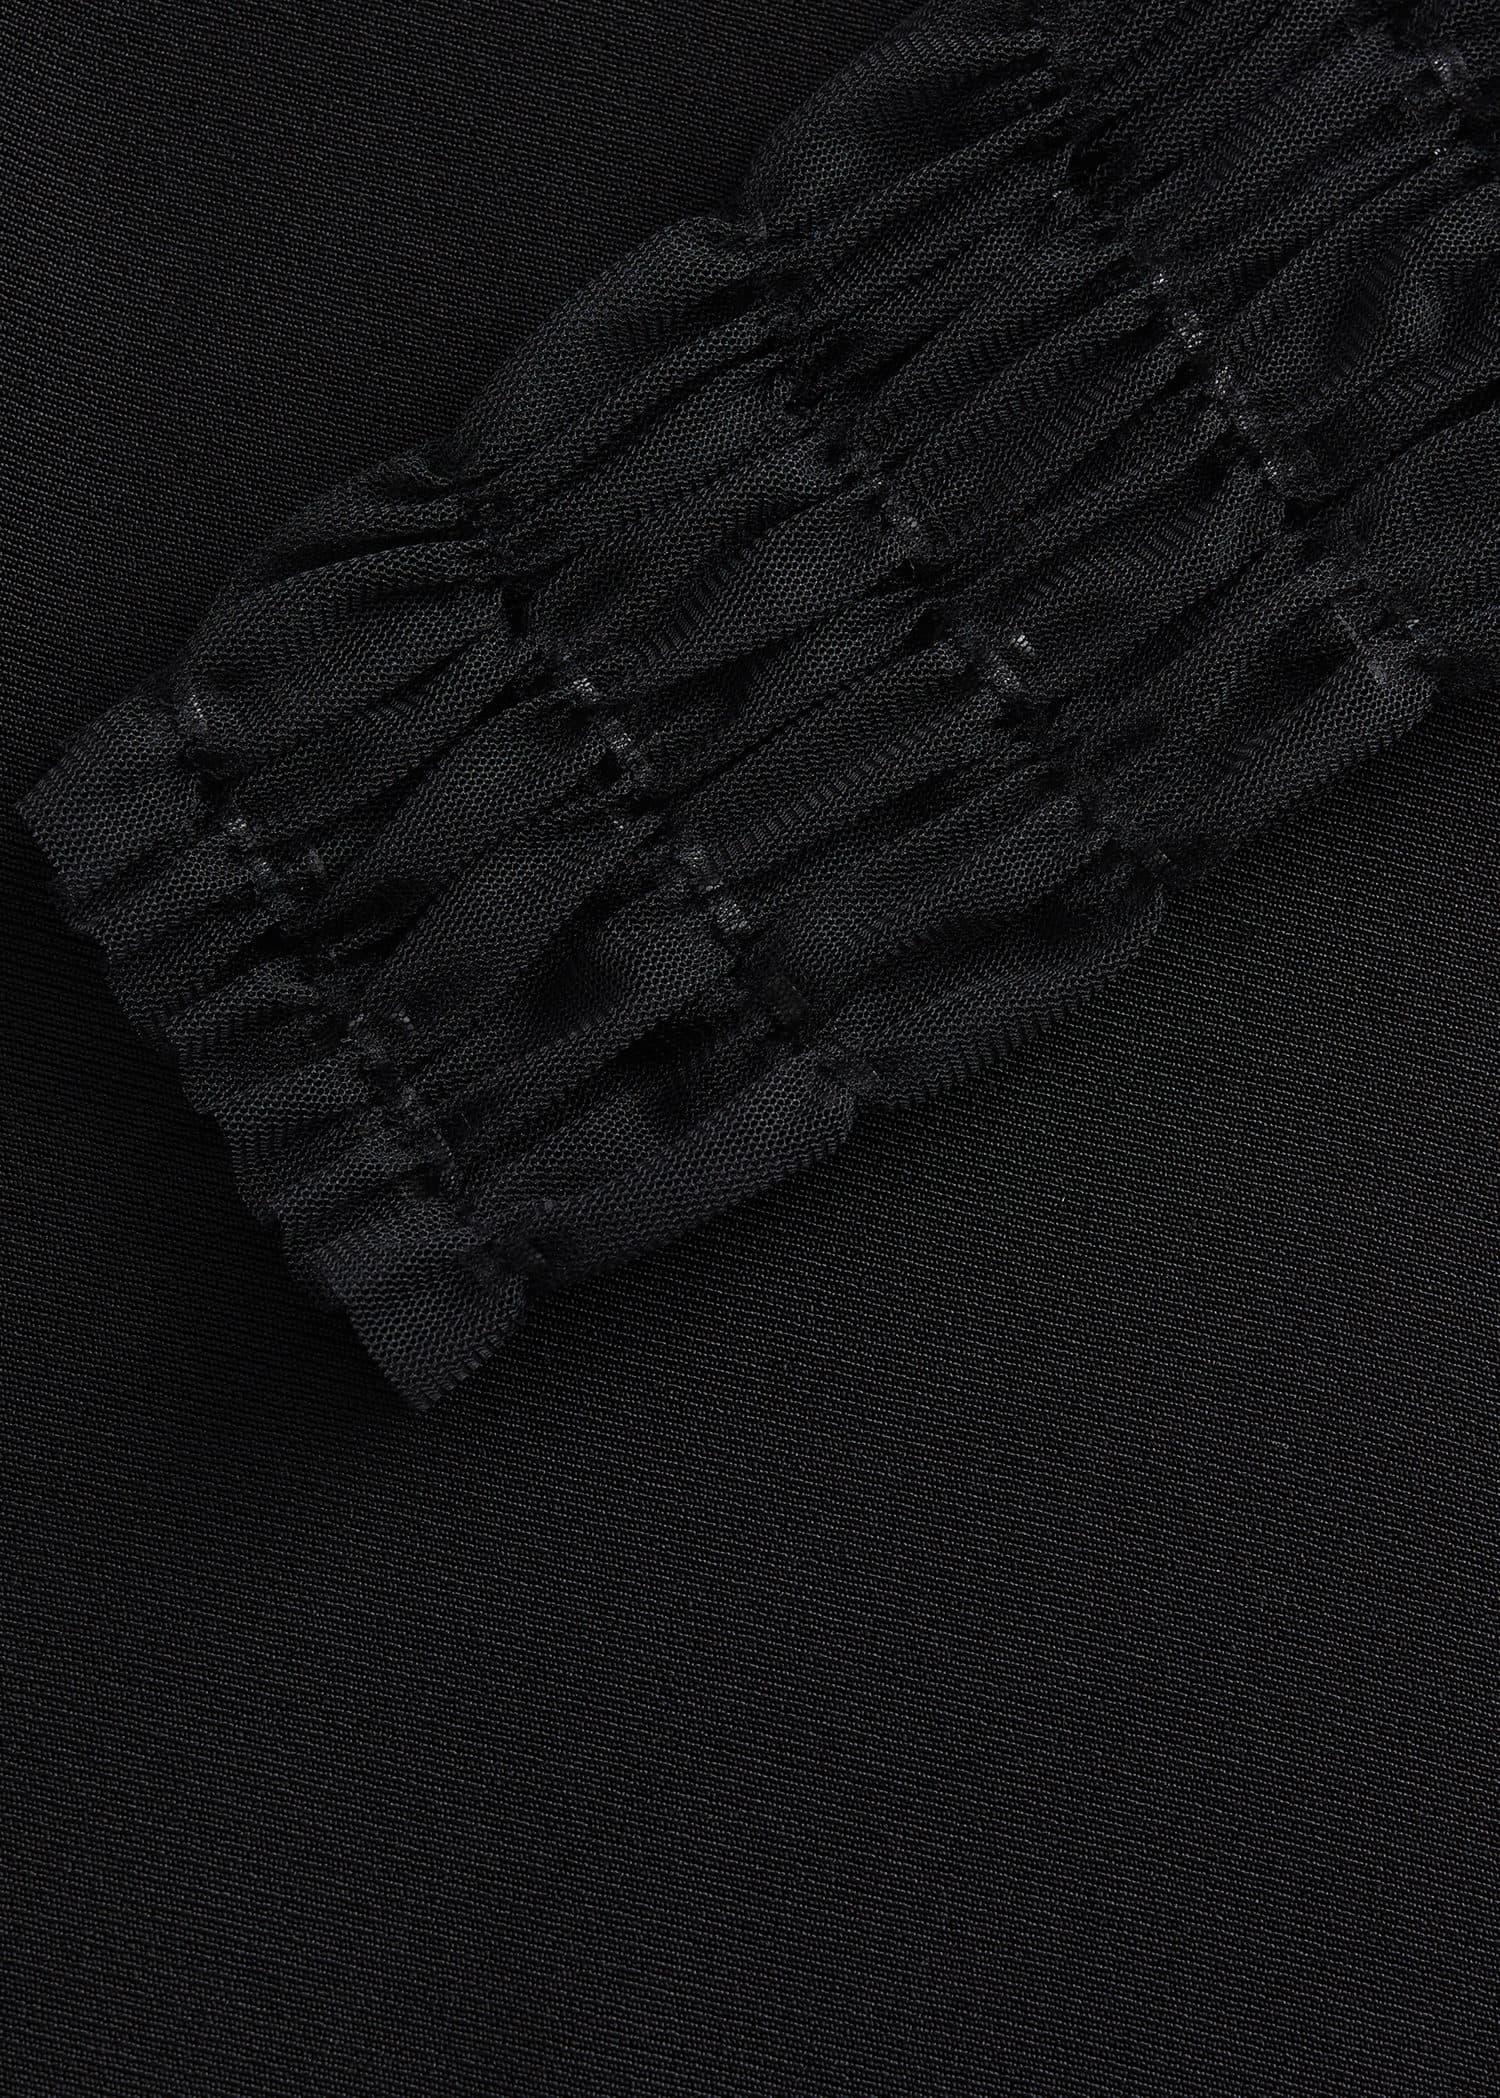 6 Lederriemen schwarz Puppenwagen Kinderwagen 30,0 x 2,0 cm Fahrzeuge Räder  wm